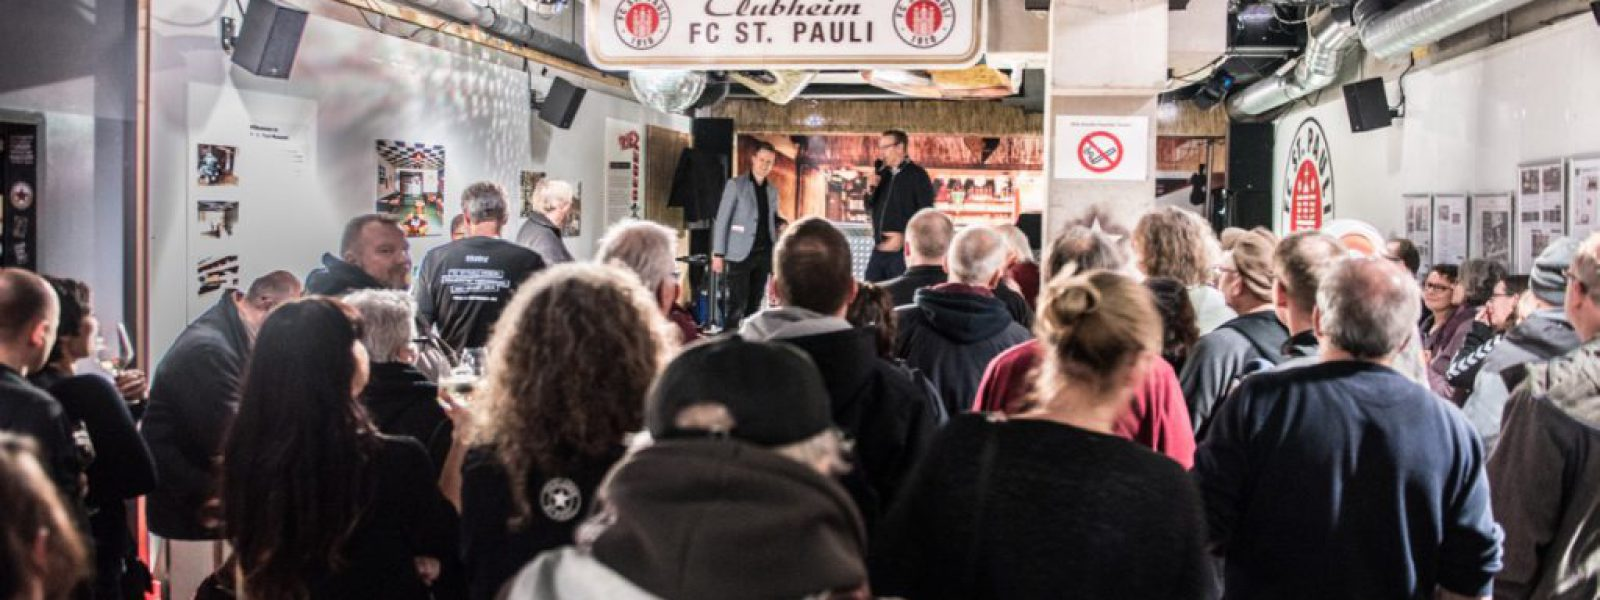 Eroeffnung FC St Pauli Museum (Foto Sabrina Adeline Nagel) - 9